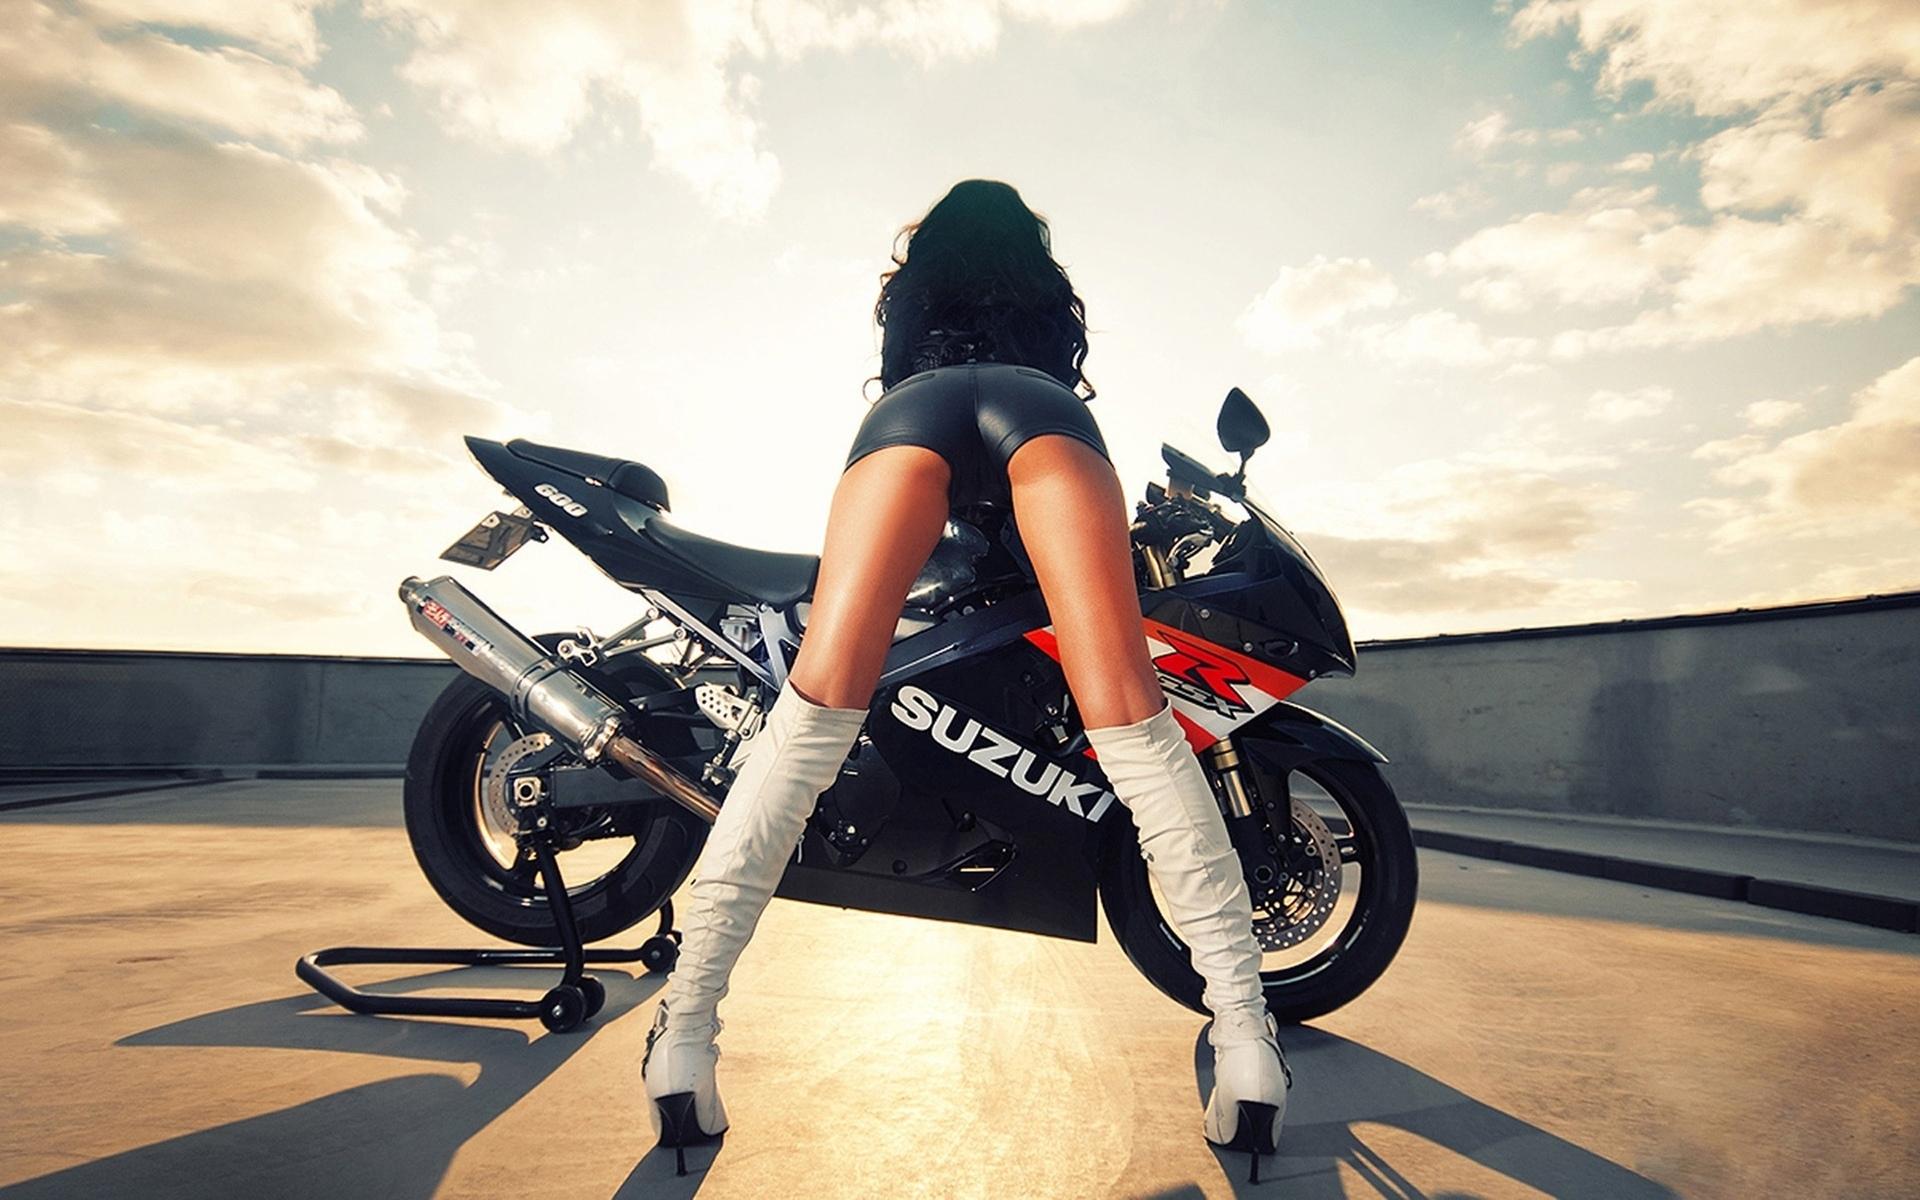 Фото брюнетки на мотоцикле 19 фотография